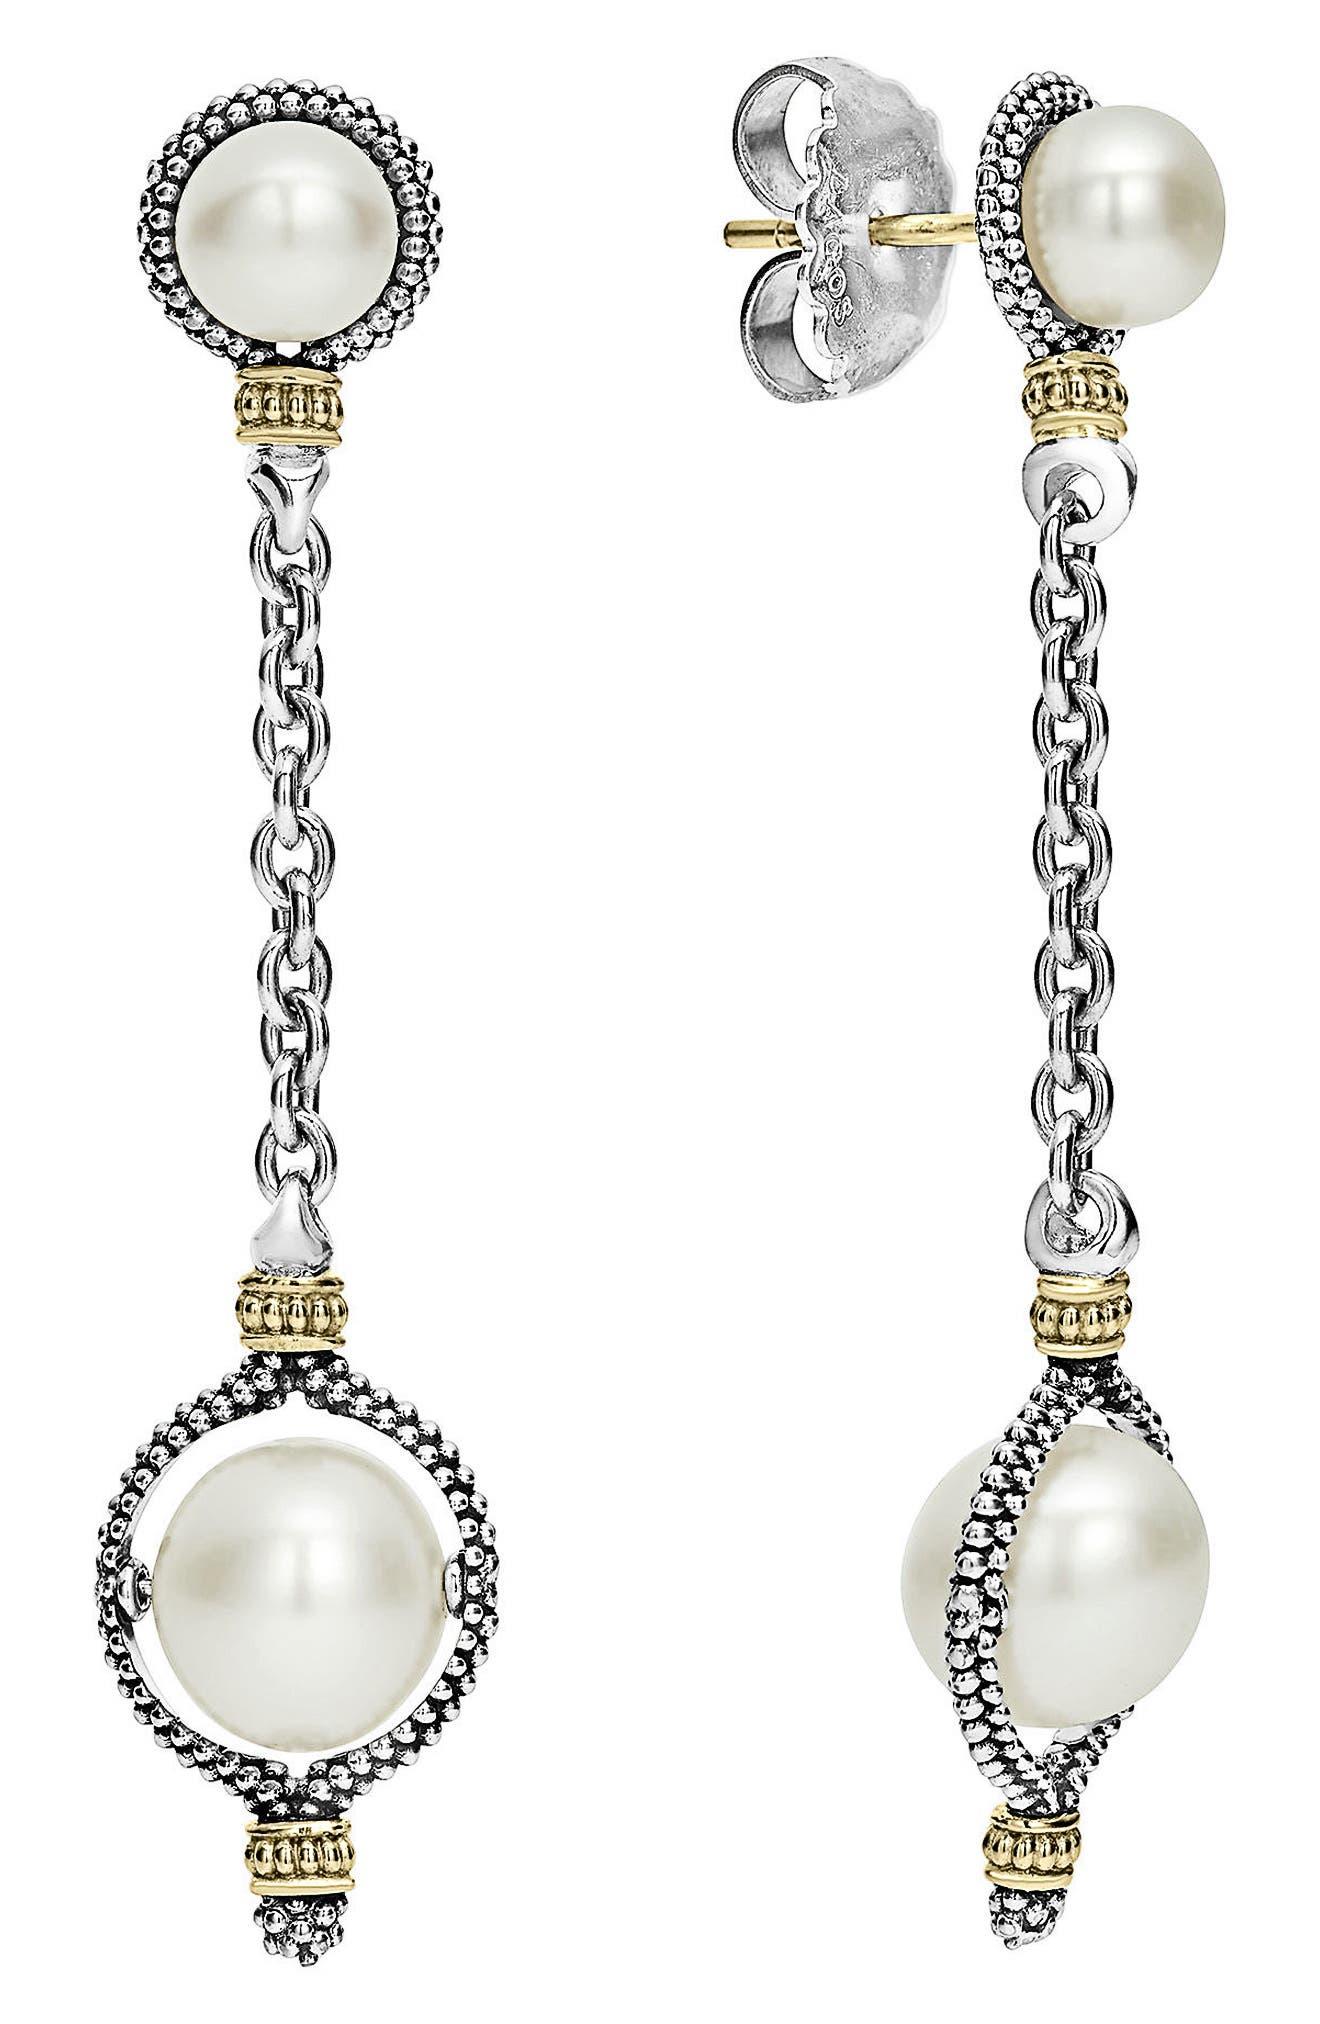 Luna Pearl Drop Earrings,                             Main thumbnail 1, color,                             SILVER/ PEARL